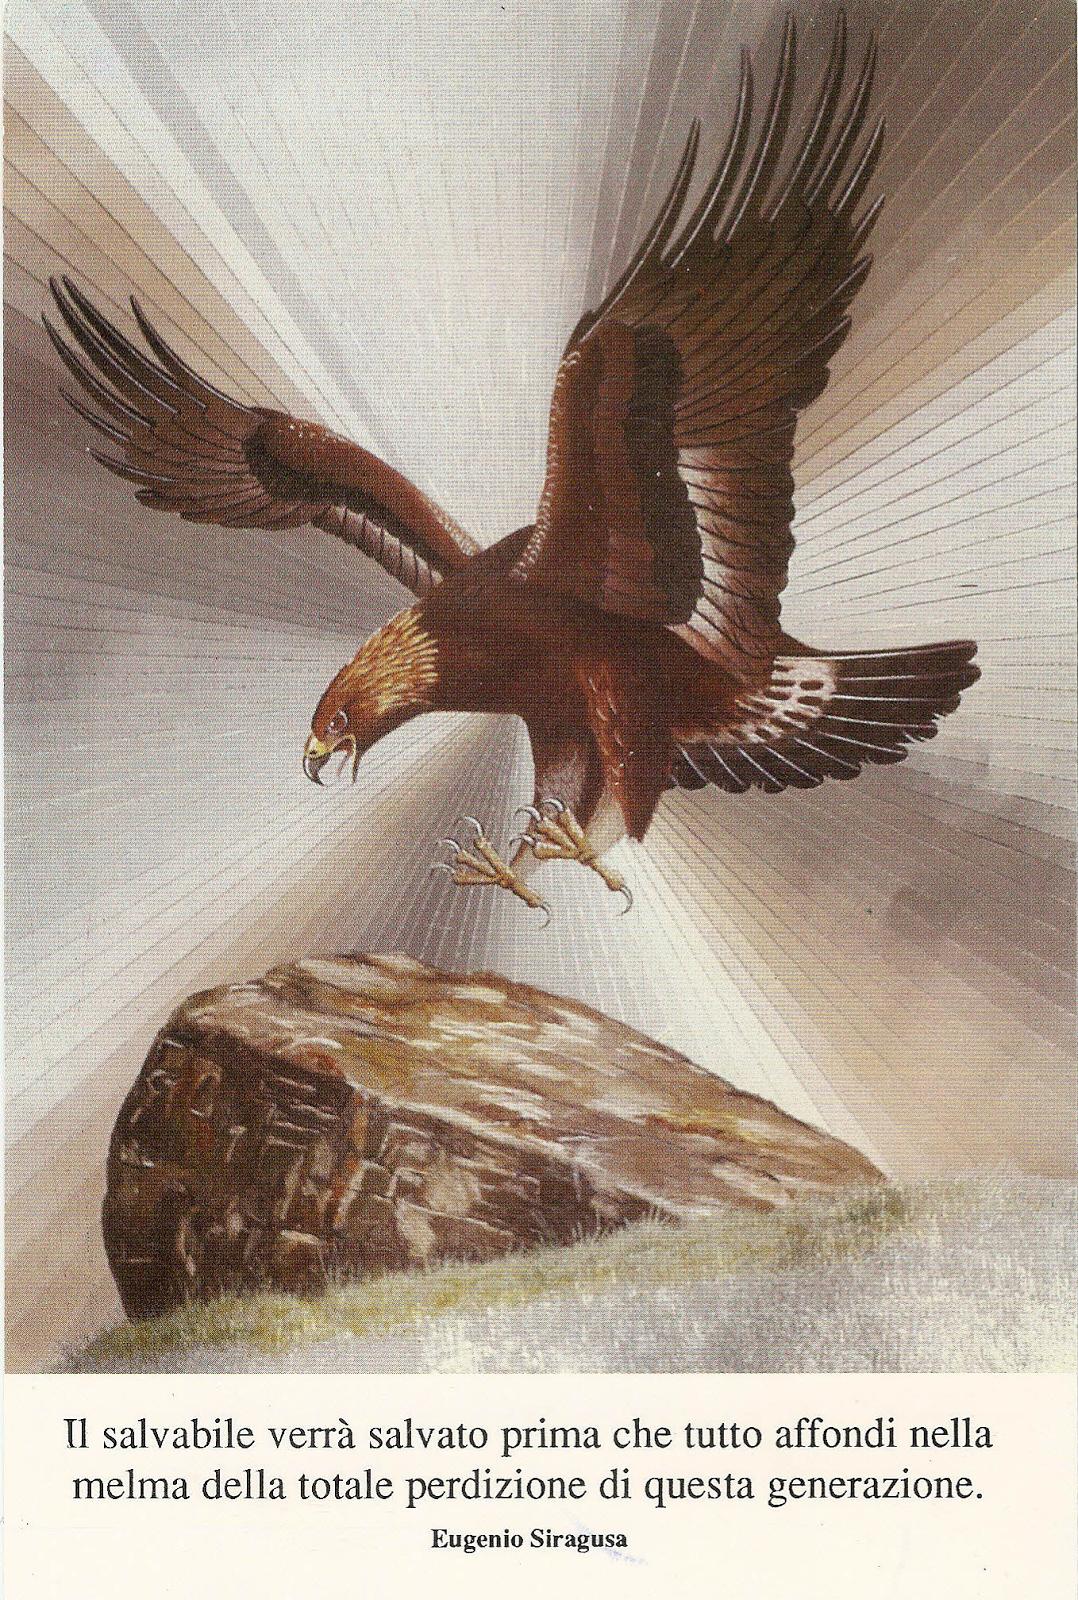 Aquila Eugenio Siragusa